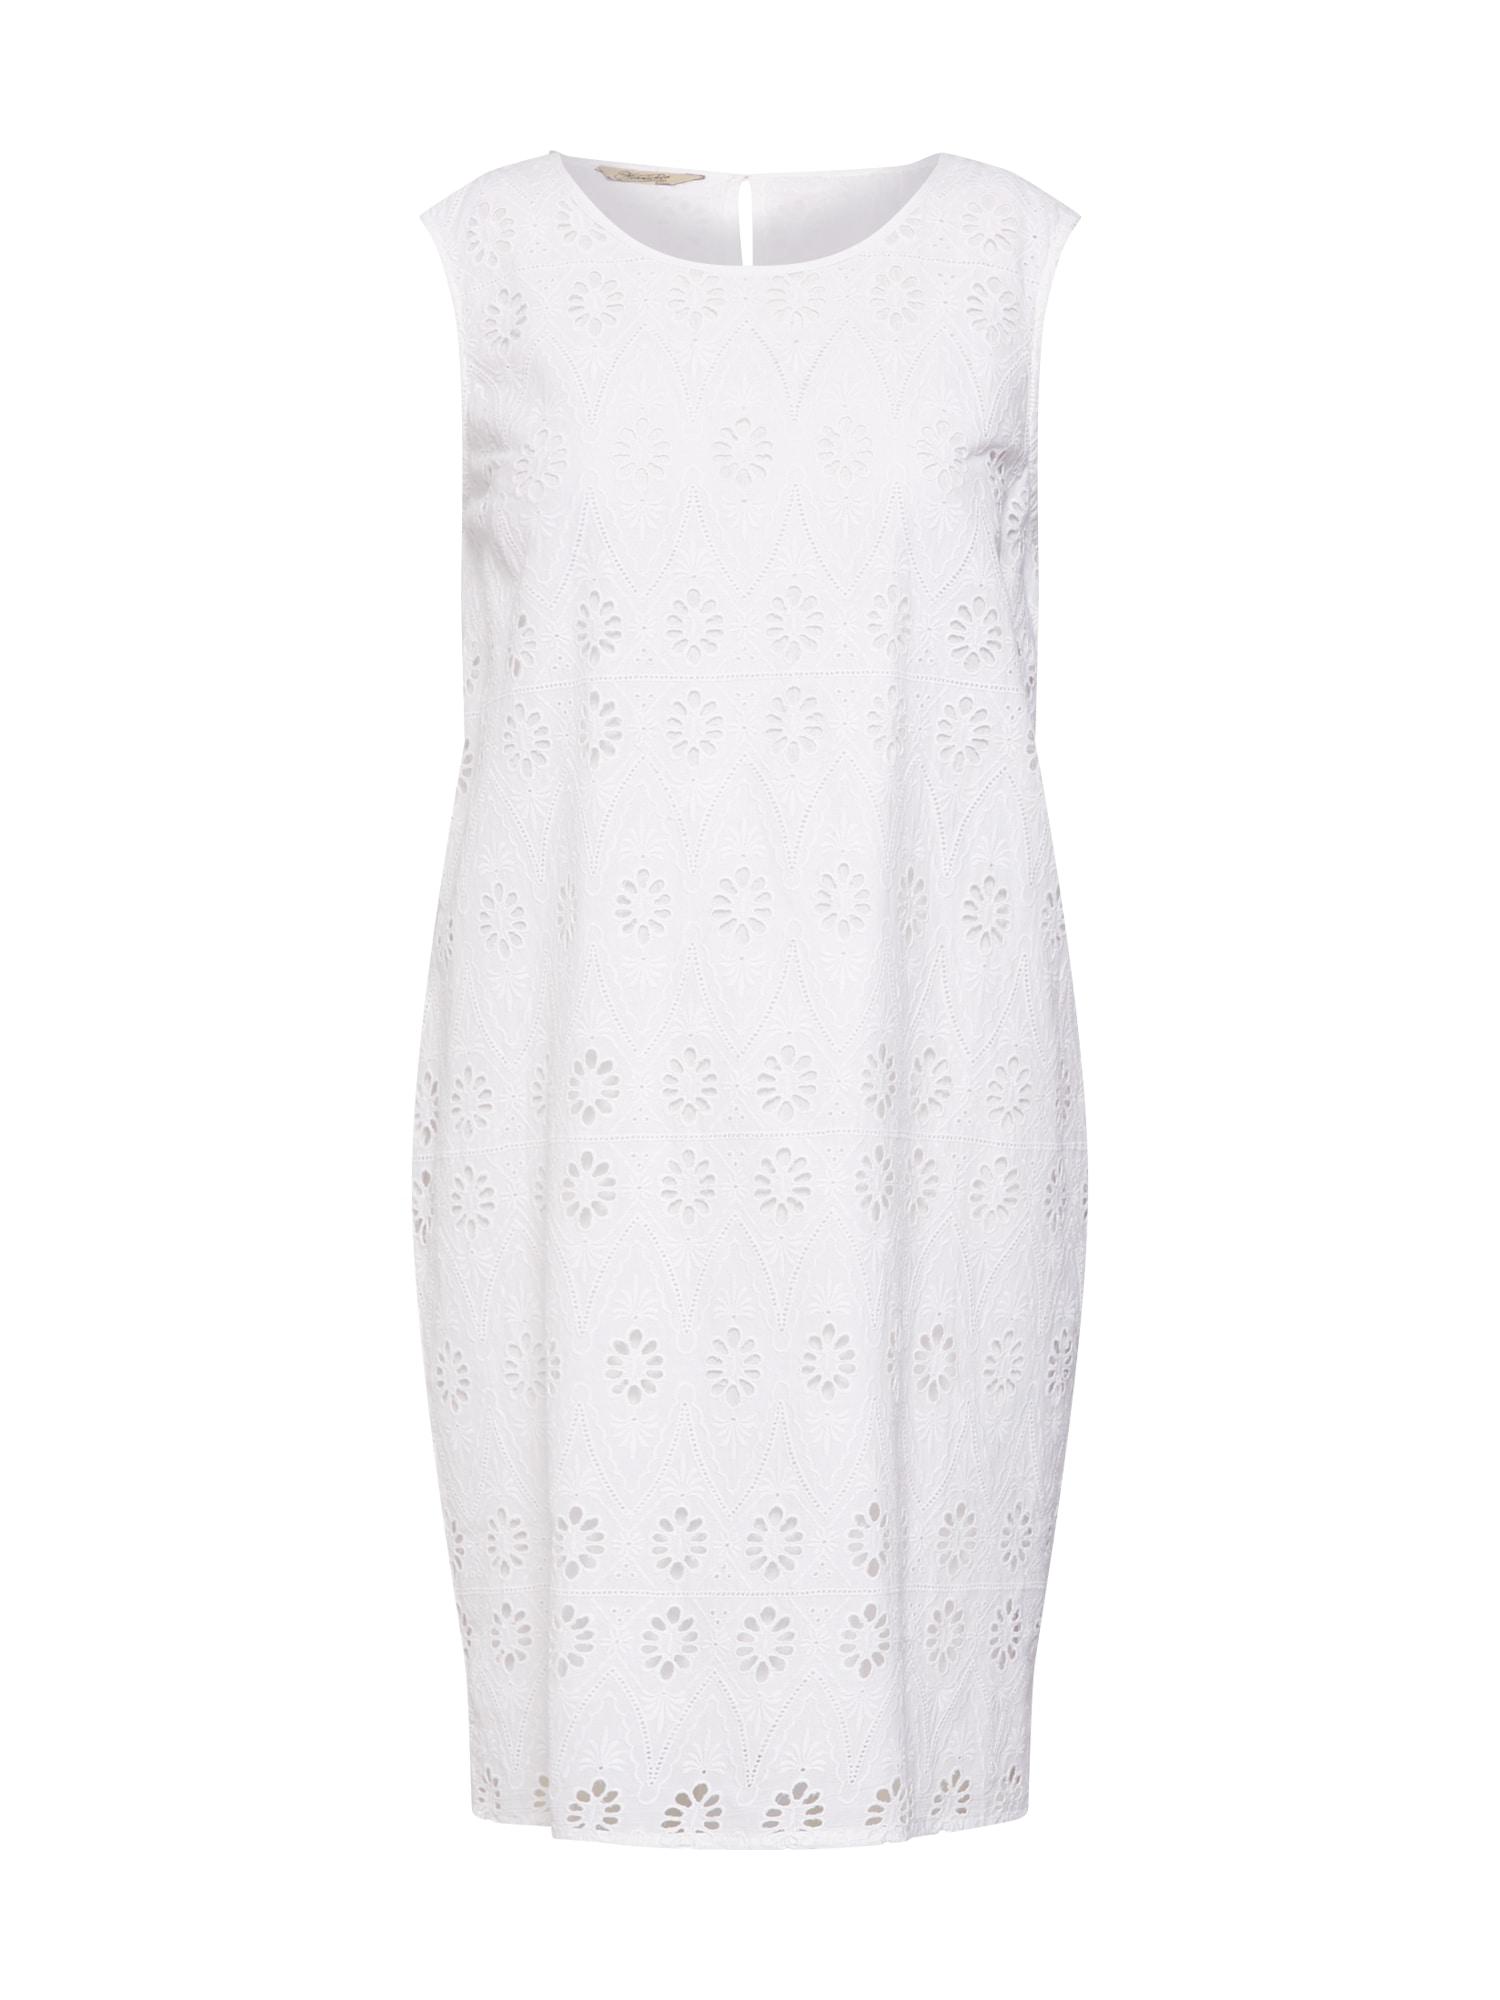 Šaty Fenja bílá Herrlicher